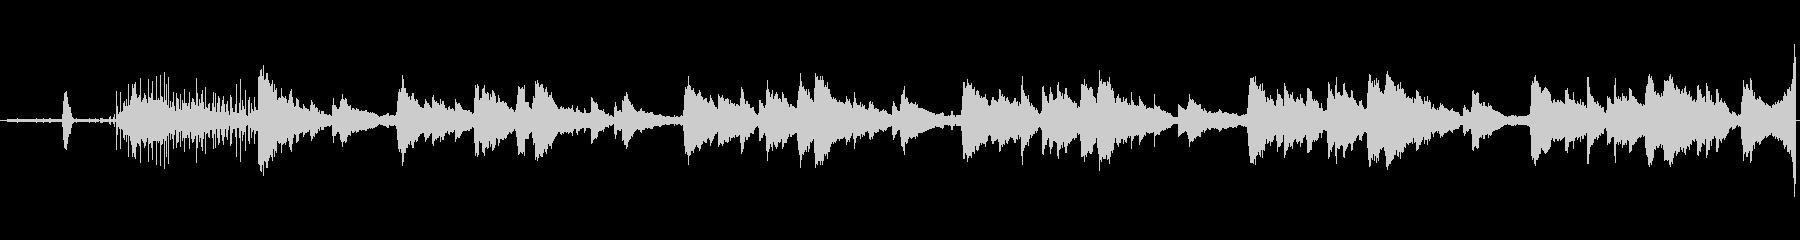 Songbirdの未再生の波形